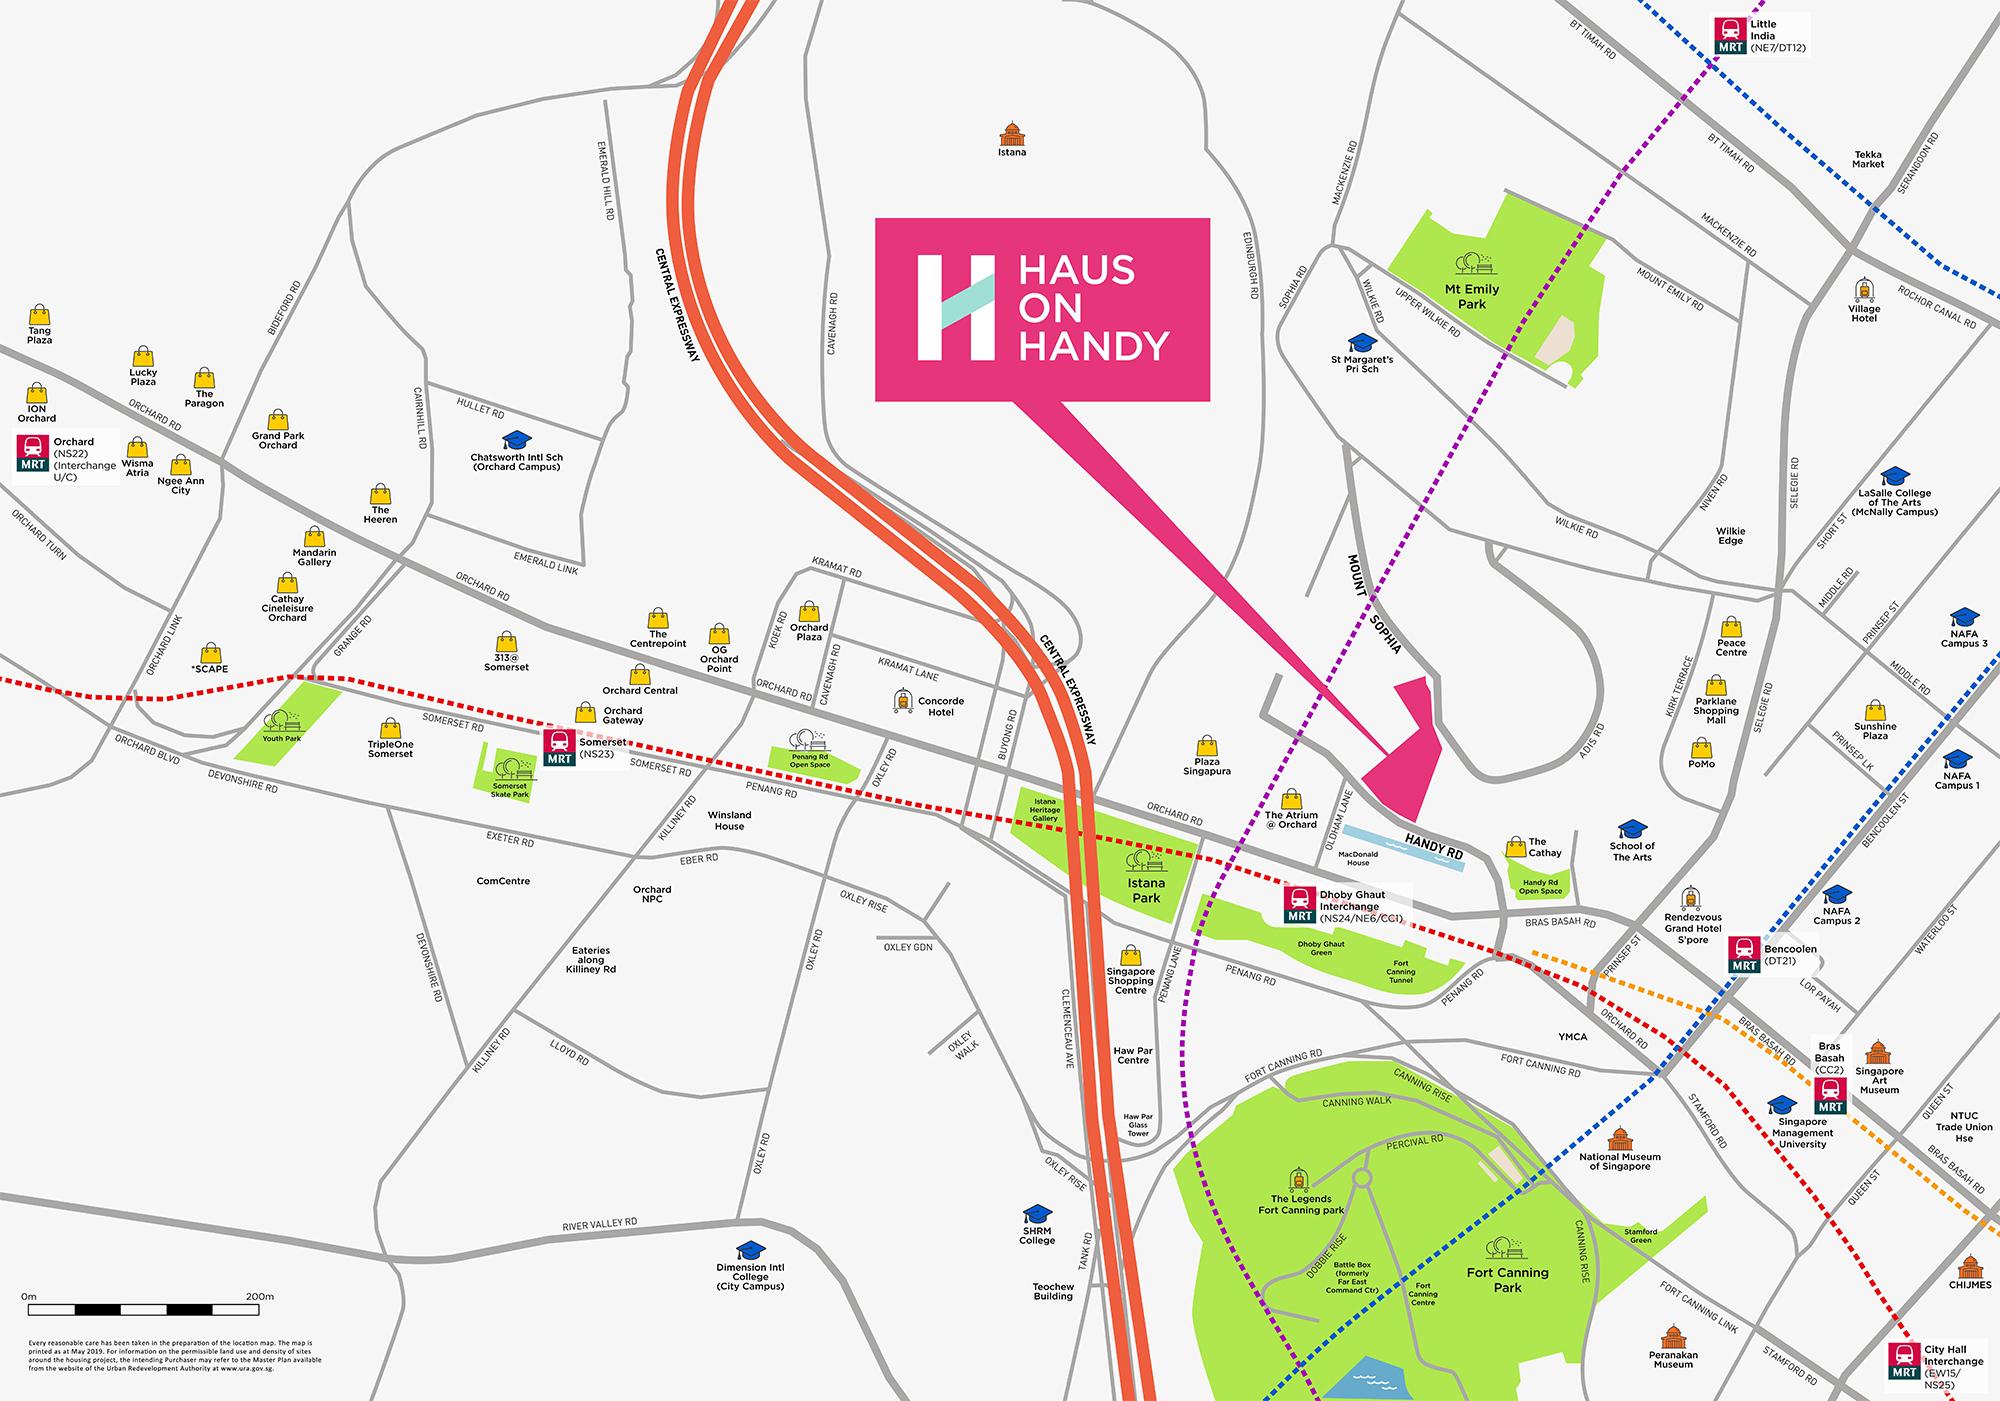 new-condo-singapore-haus-on-handy-location-map